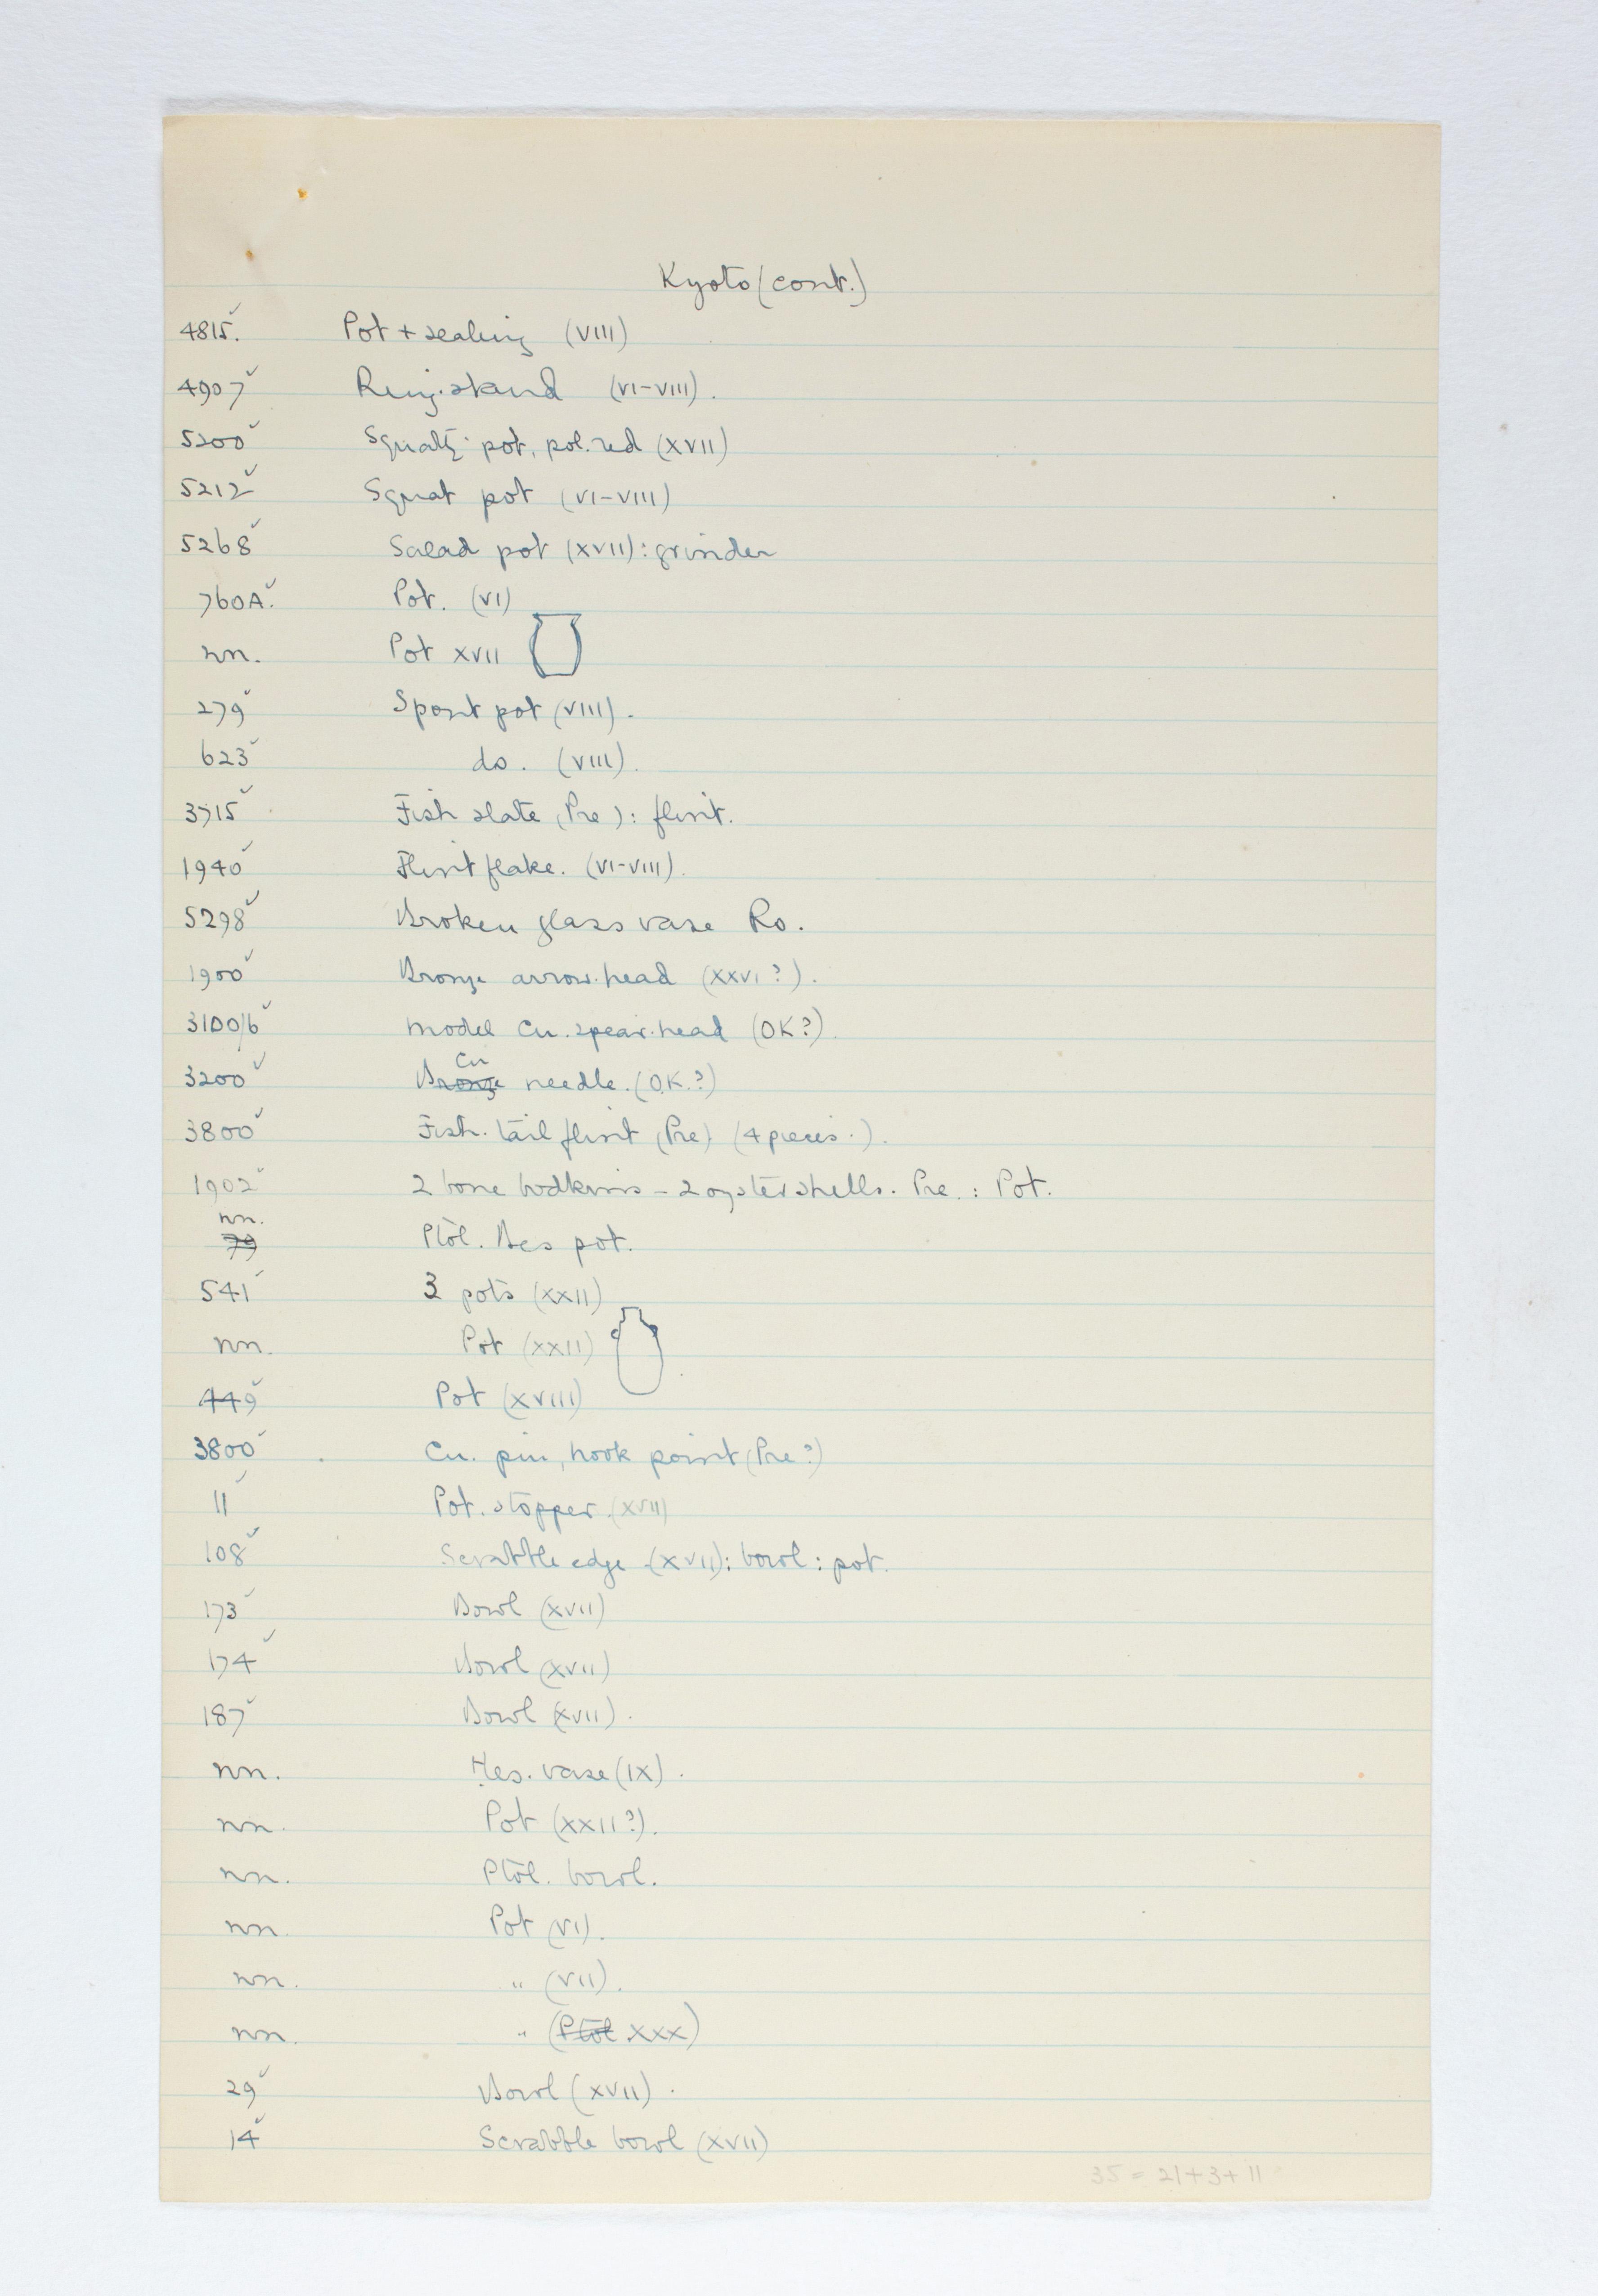 1923-24 Qau el-Kebir, Hemamieh Individual institution list PMA/WFP1/D/27/14.3